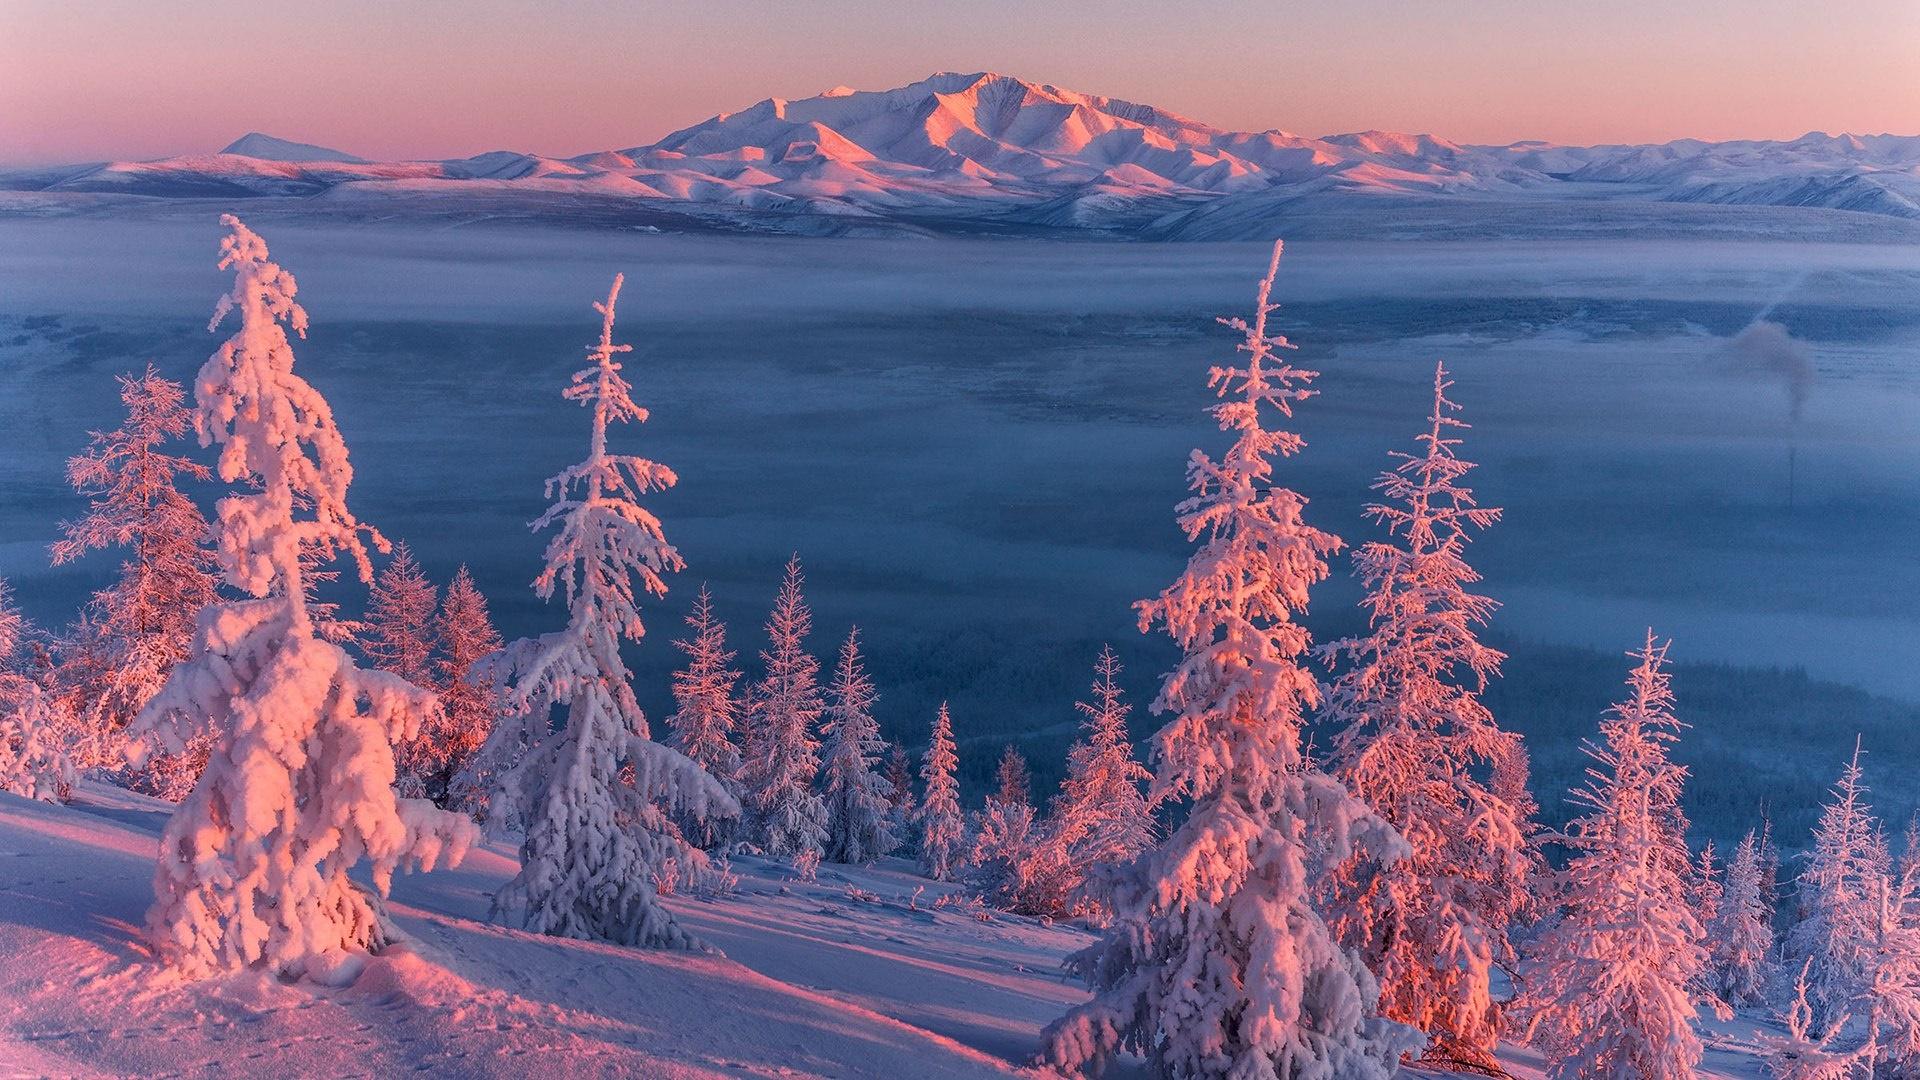 Pink winter landscape wallpaper